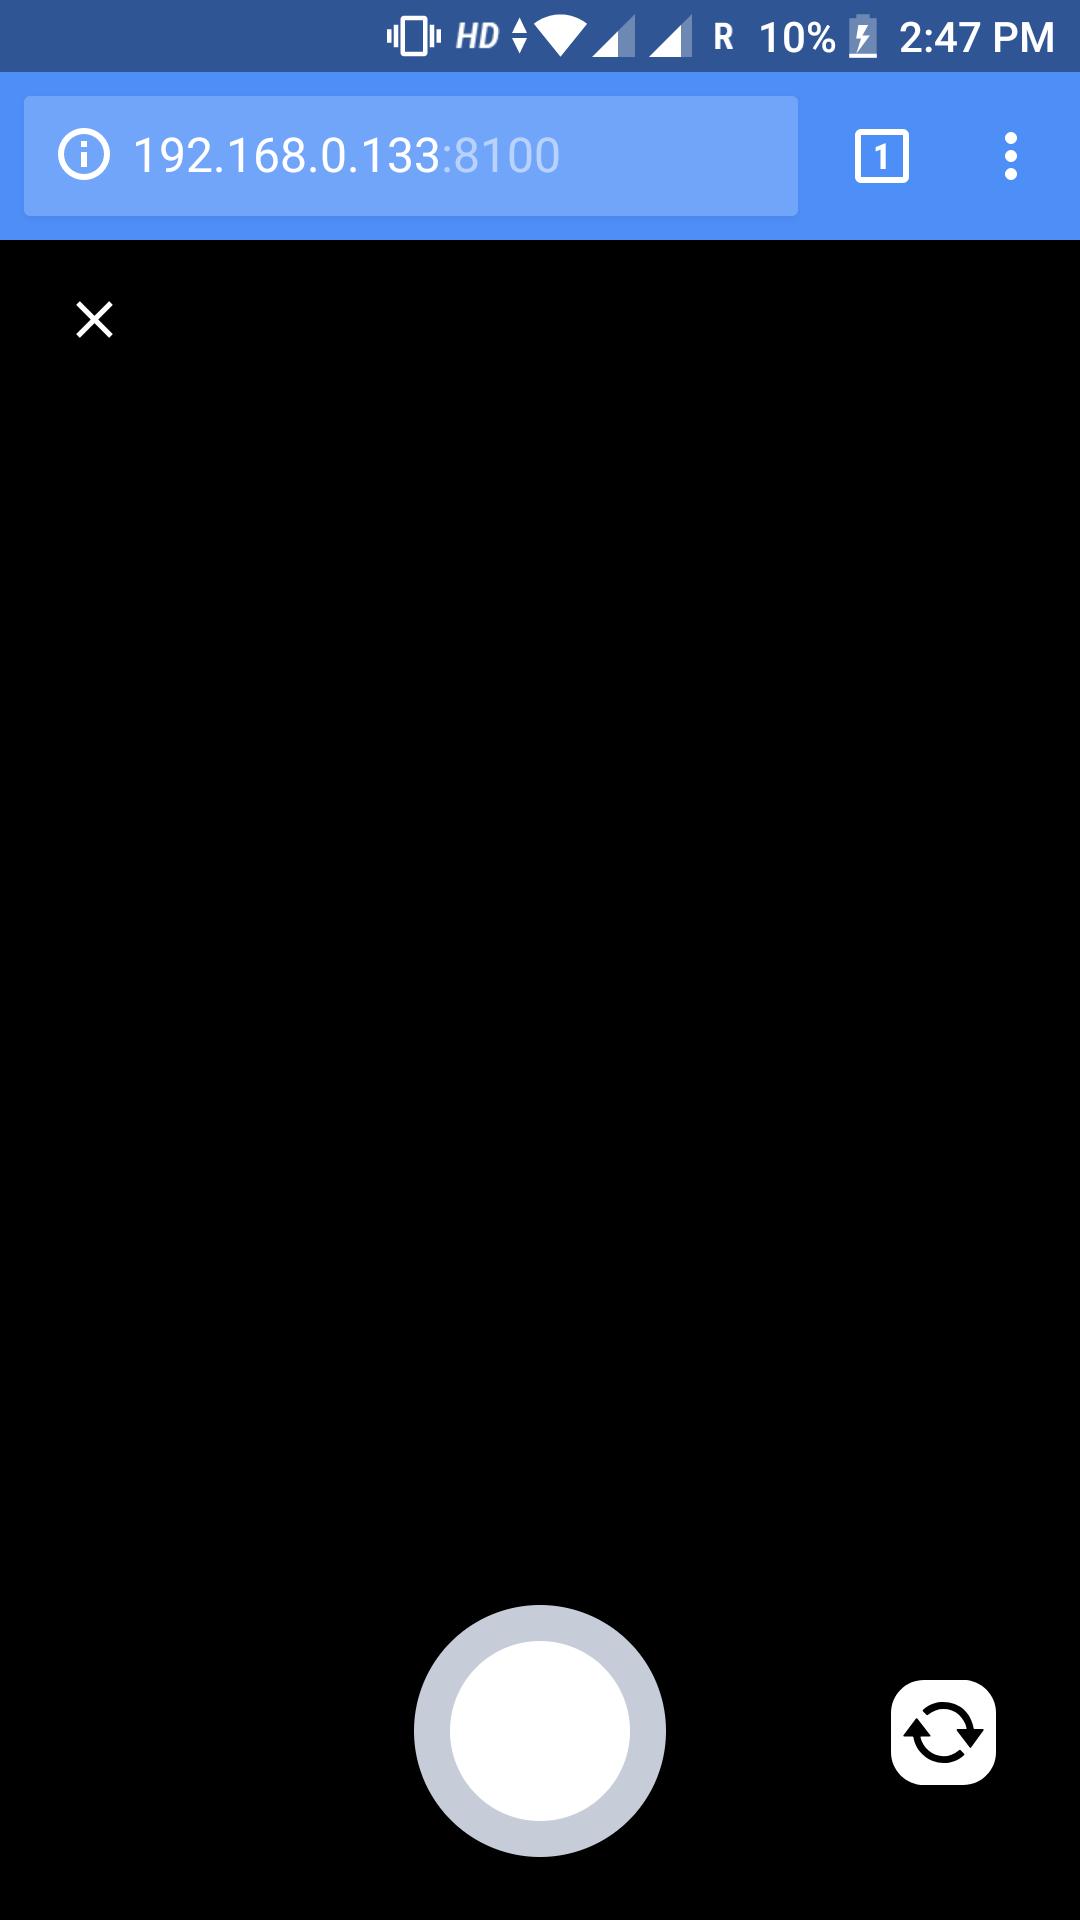 Capture Image(PWA) · Issue #539 · ionic-team/capacitor · GitHub